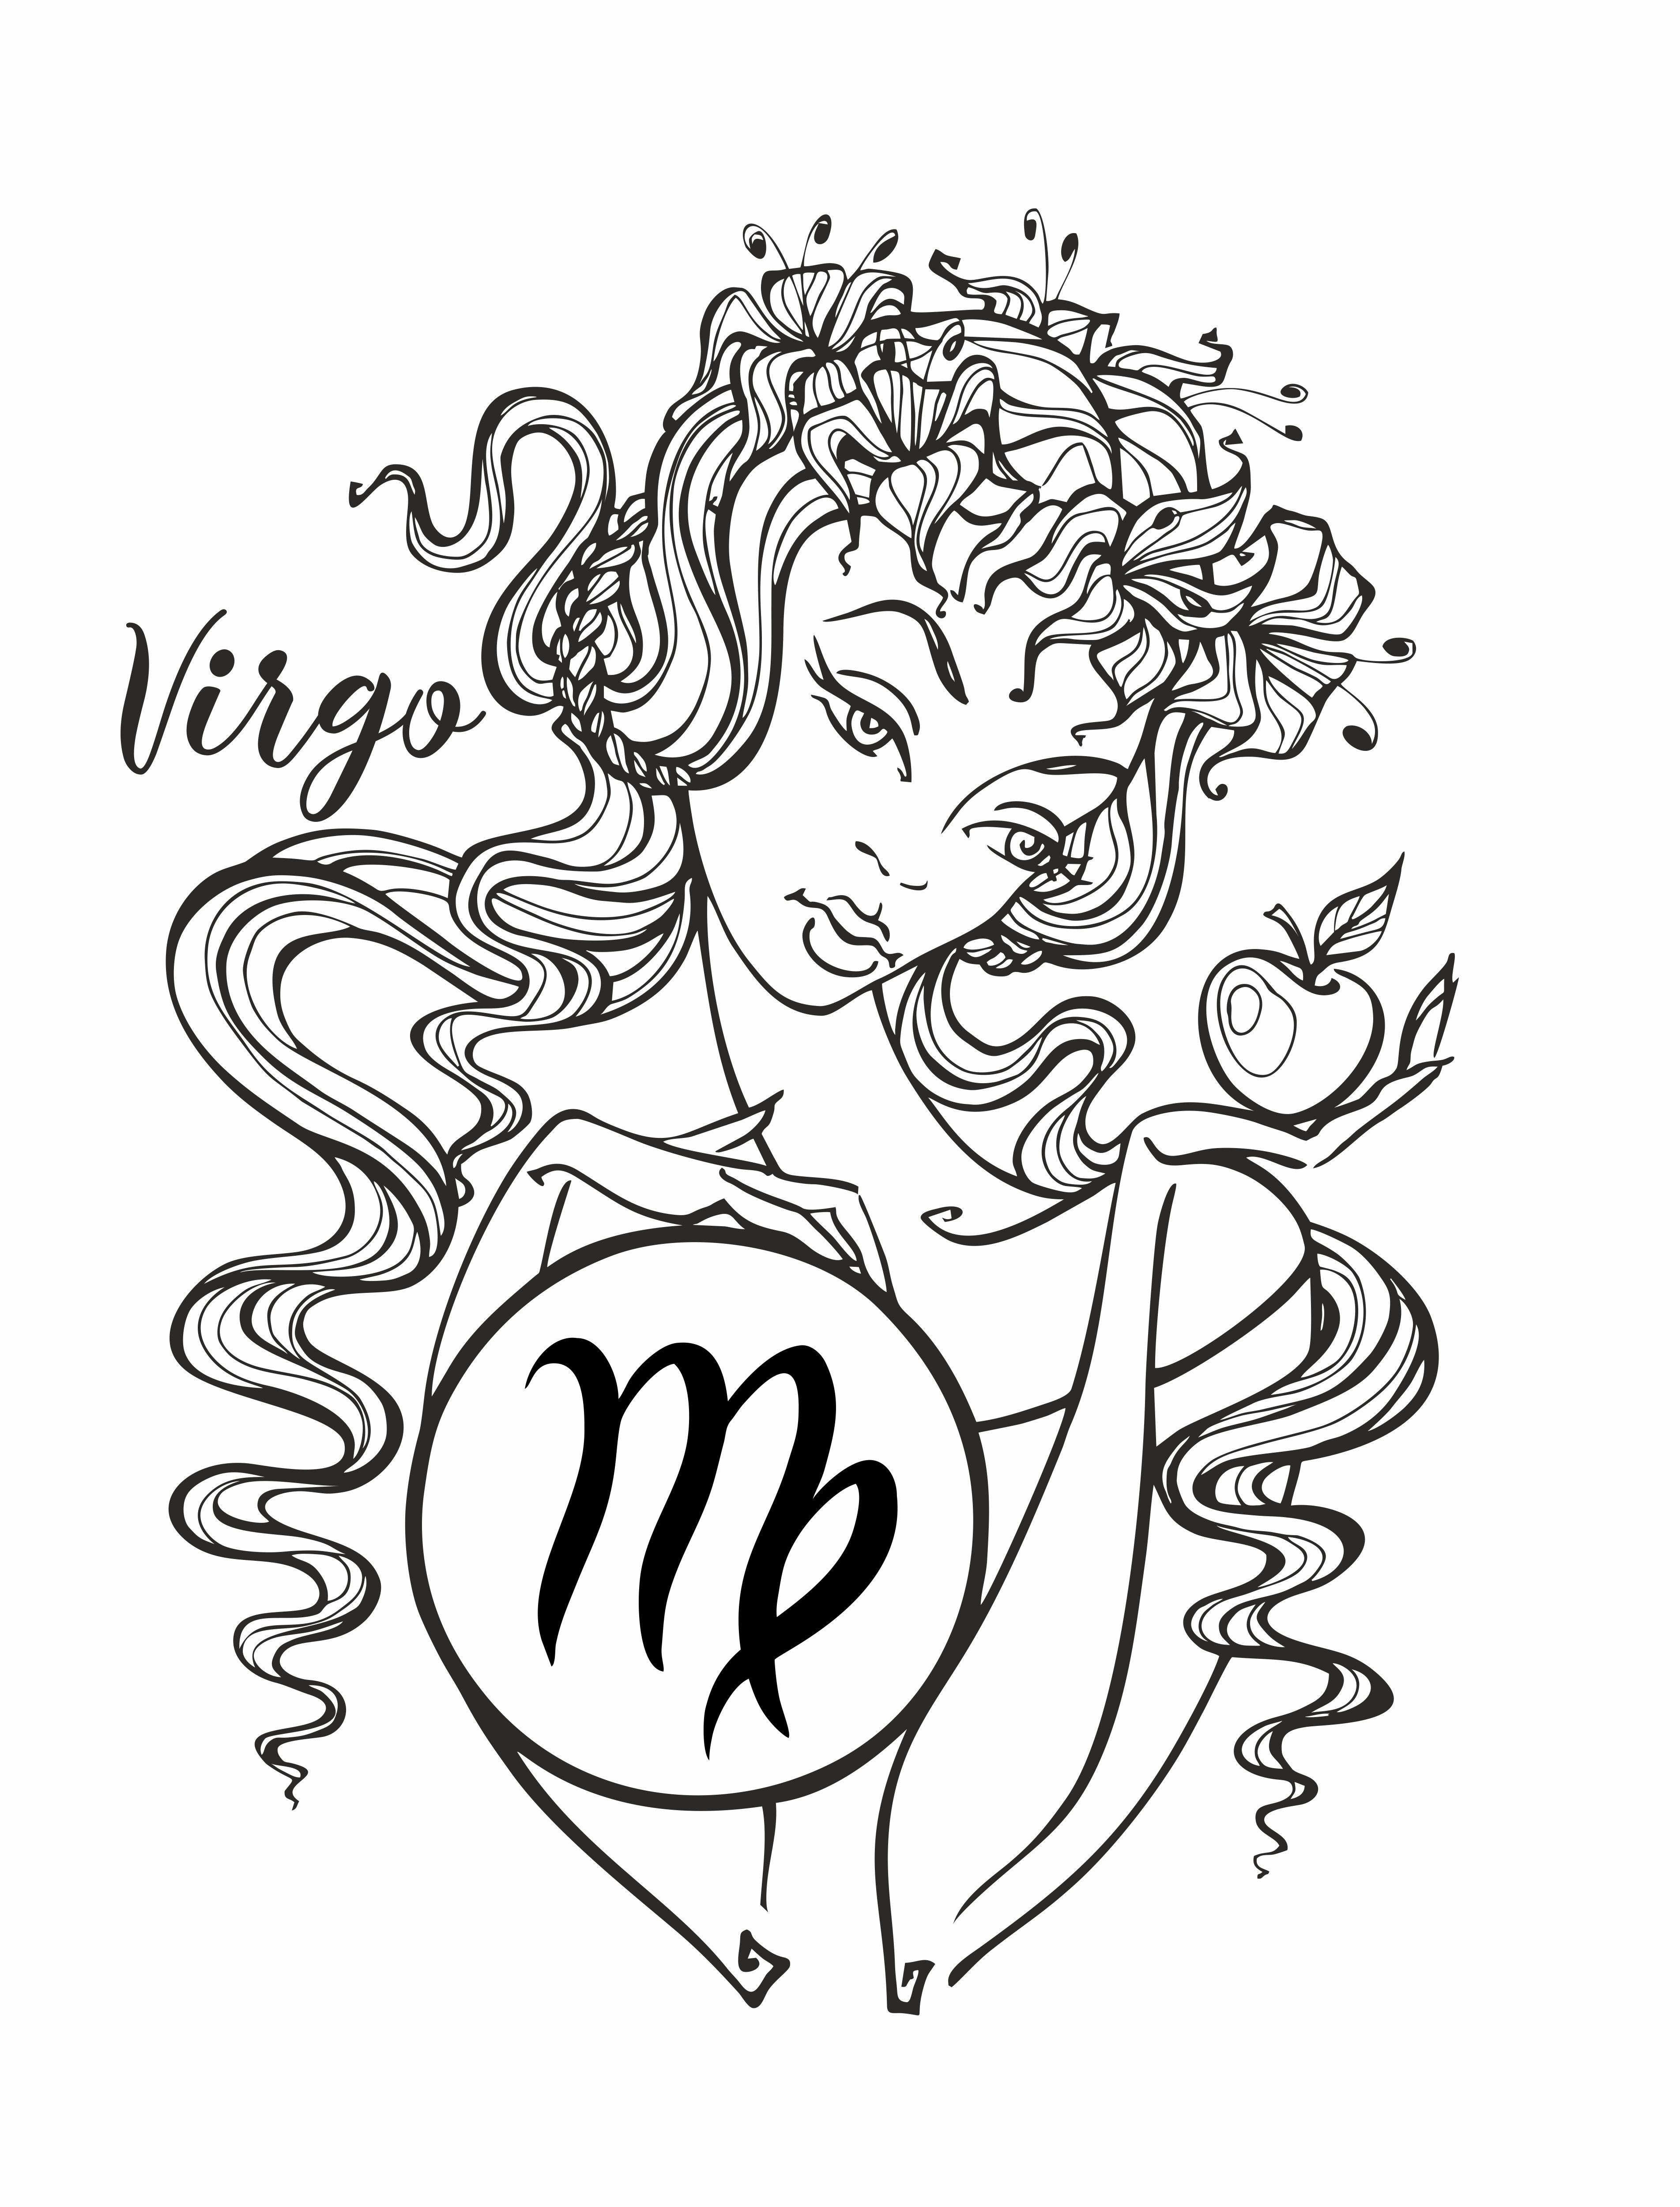 zodiac sign virgo a beautiful horoscope astrology